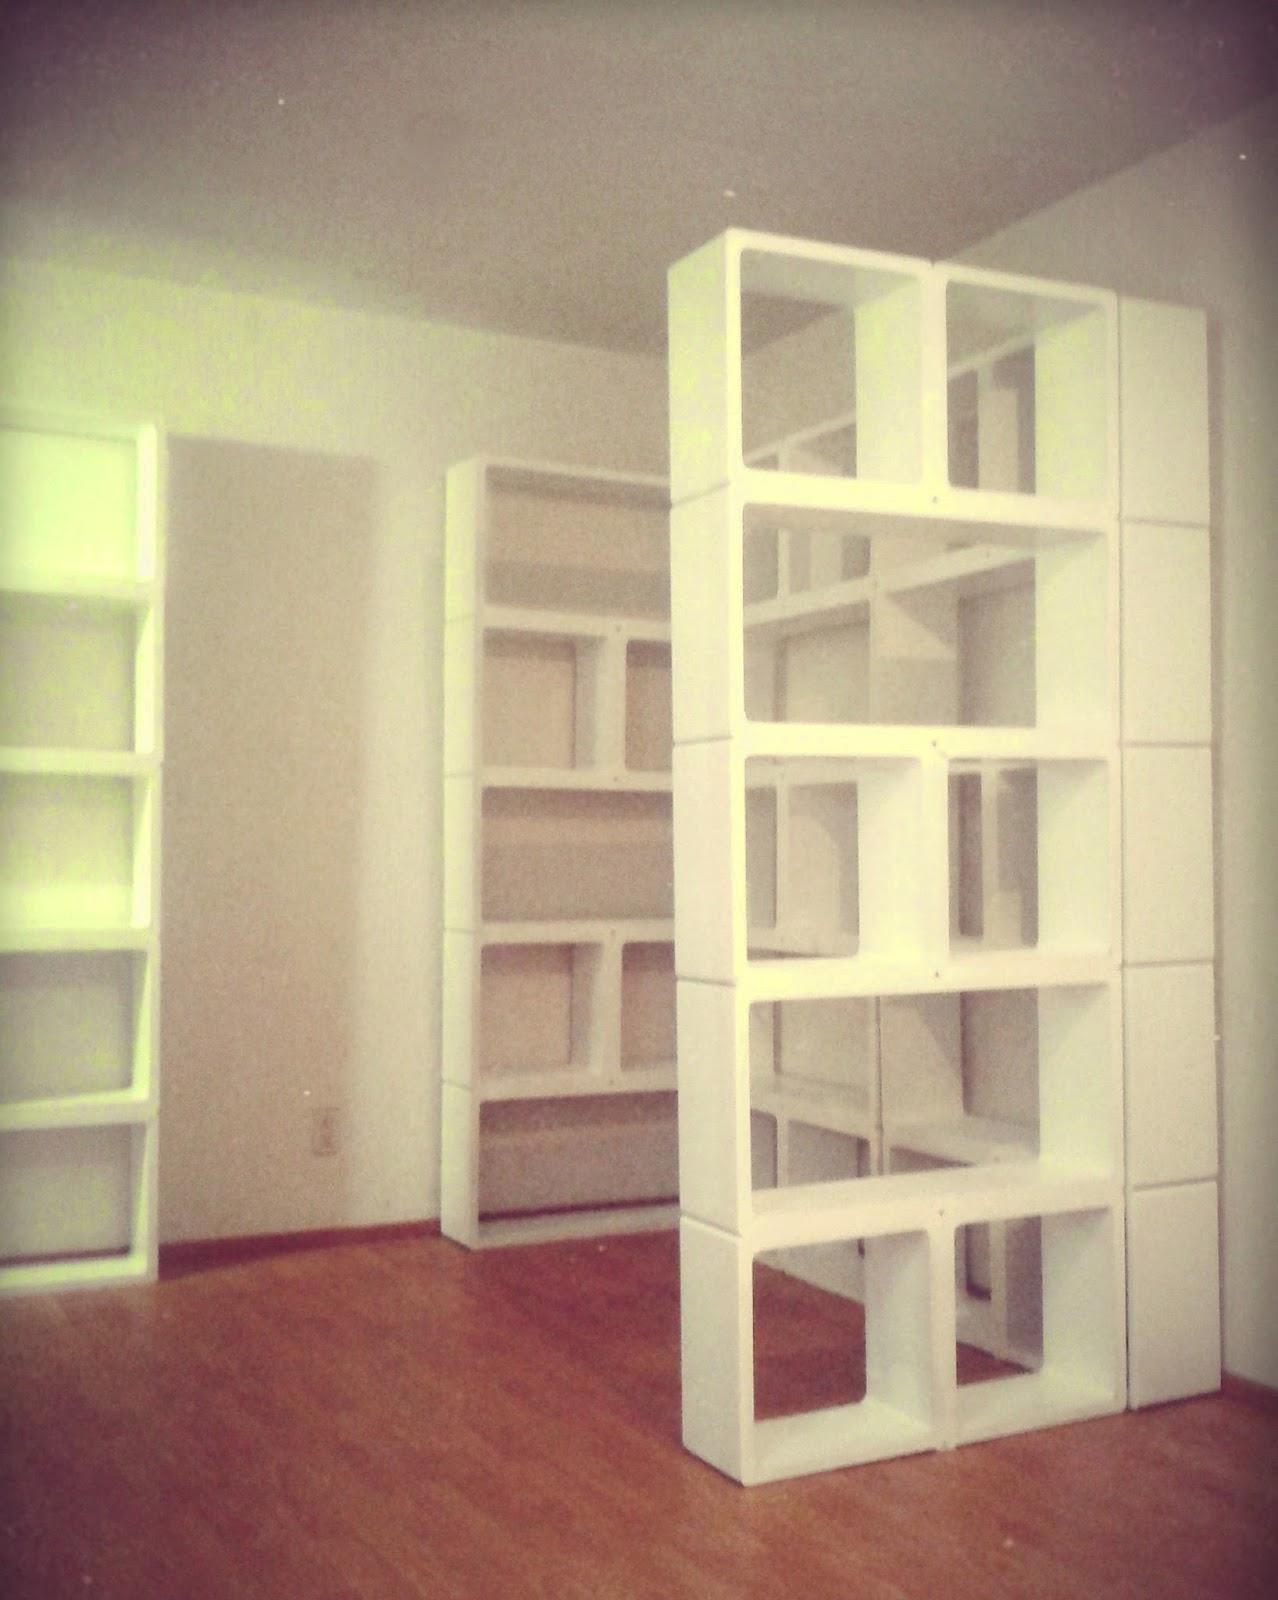 Divisor de espacios separaci n de sala y comedor m xico for Comedores modernos mexico df